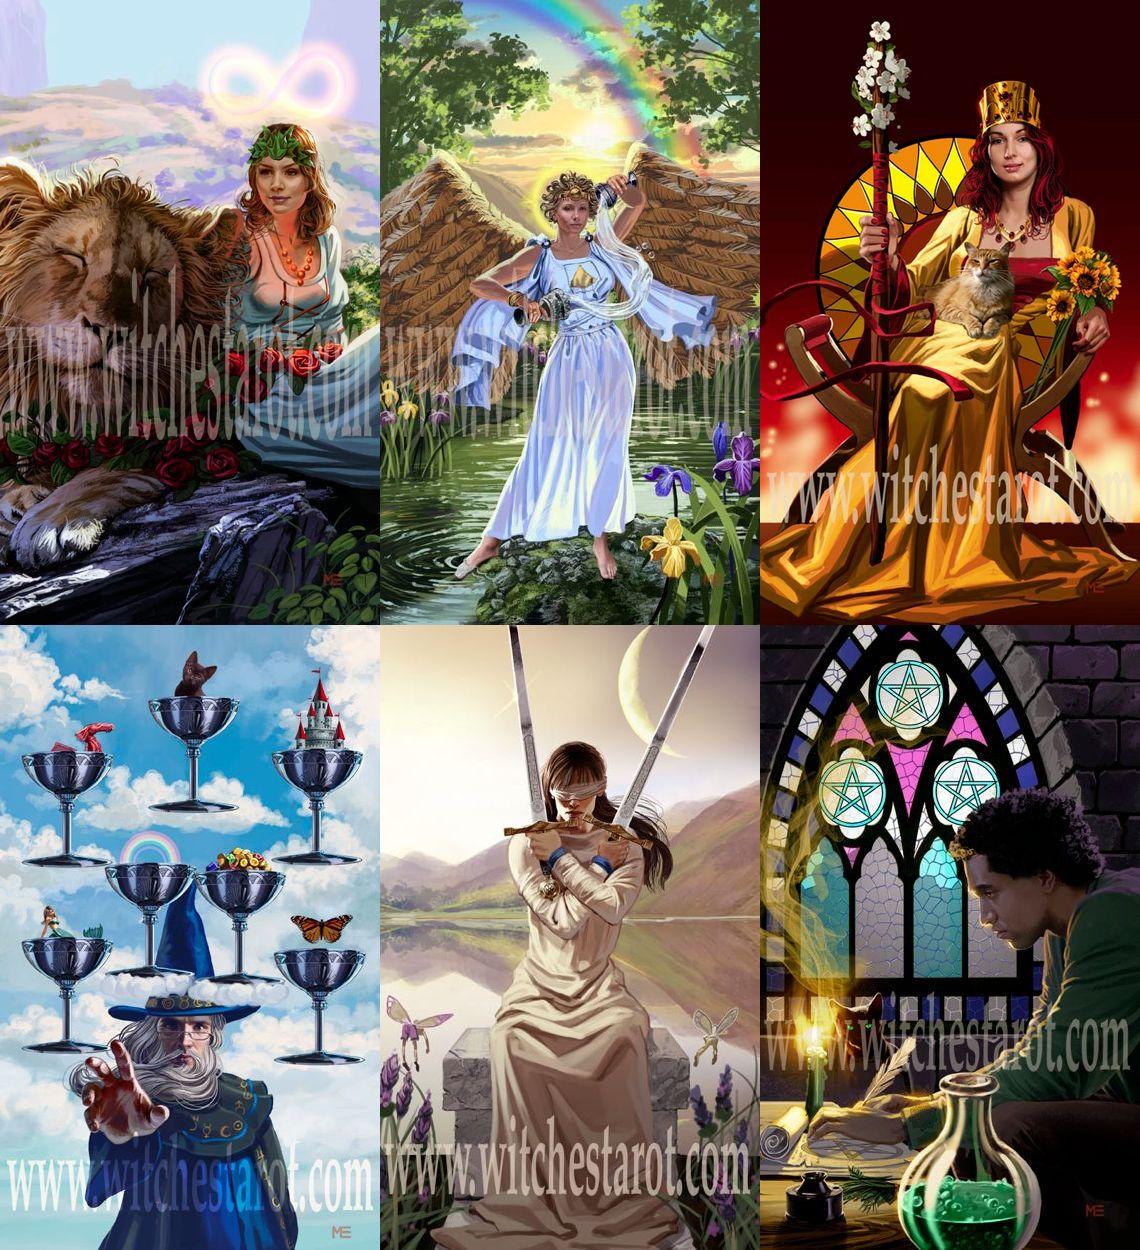 The Witches Tarot ไพ่ทาโรต์แม่มด วิคคา เพแกน ellen dugan ไพ่ทาโร่ ไพ่ยิบซี mark evans ไพ่ Strength ไพ่ Temperance ราชินีไม้เท้า Queen of Wands ไพ่เจ็ดถ้วย Seven Cups ไพ่สองดาบ Two Swords ไพ่สามเหรียญ Three Pentacles